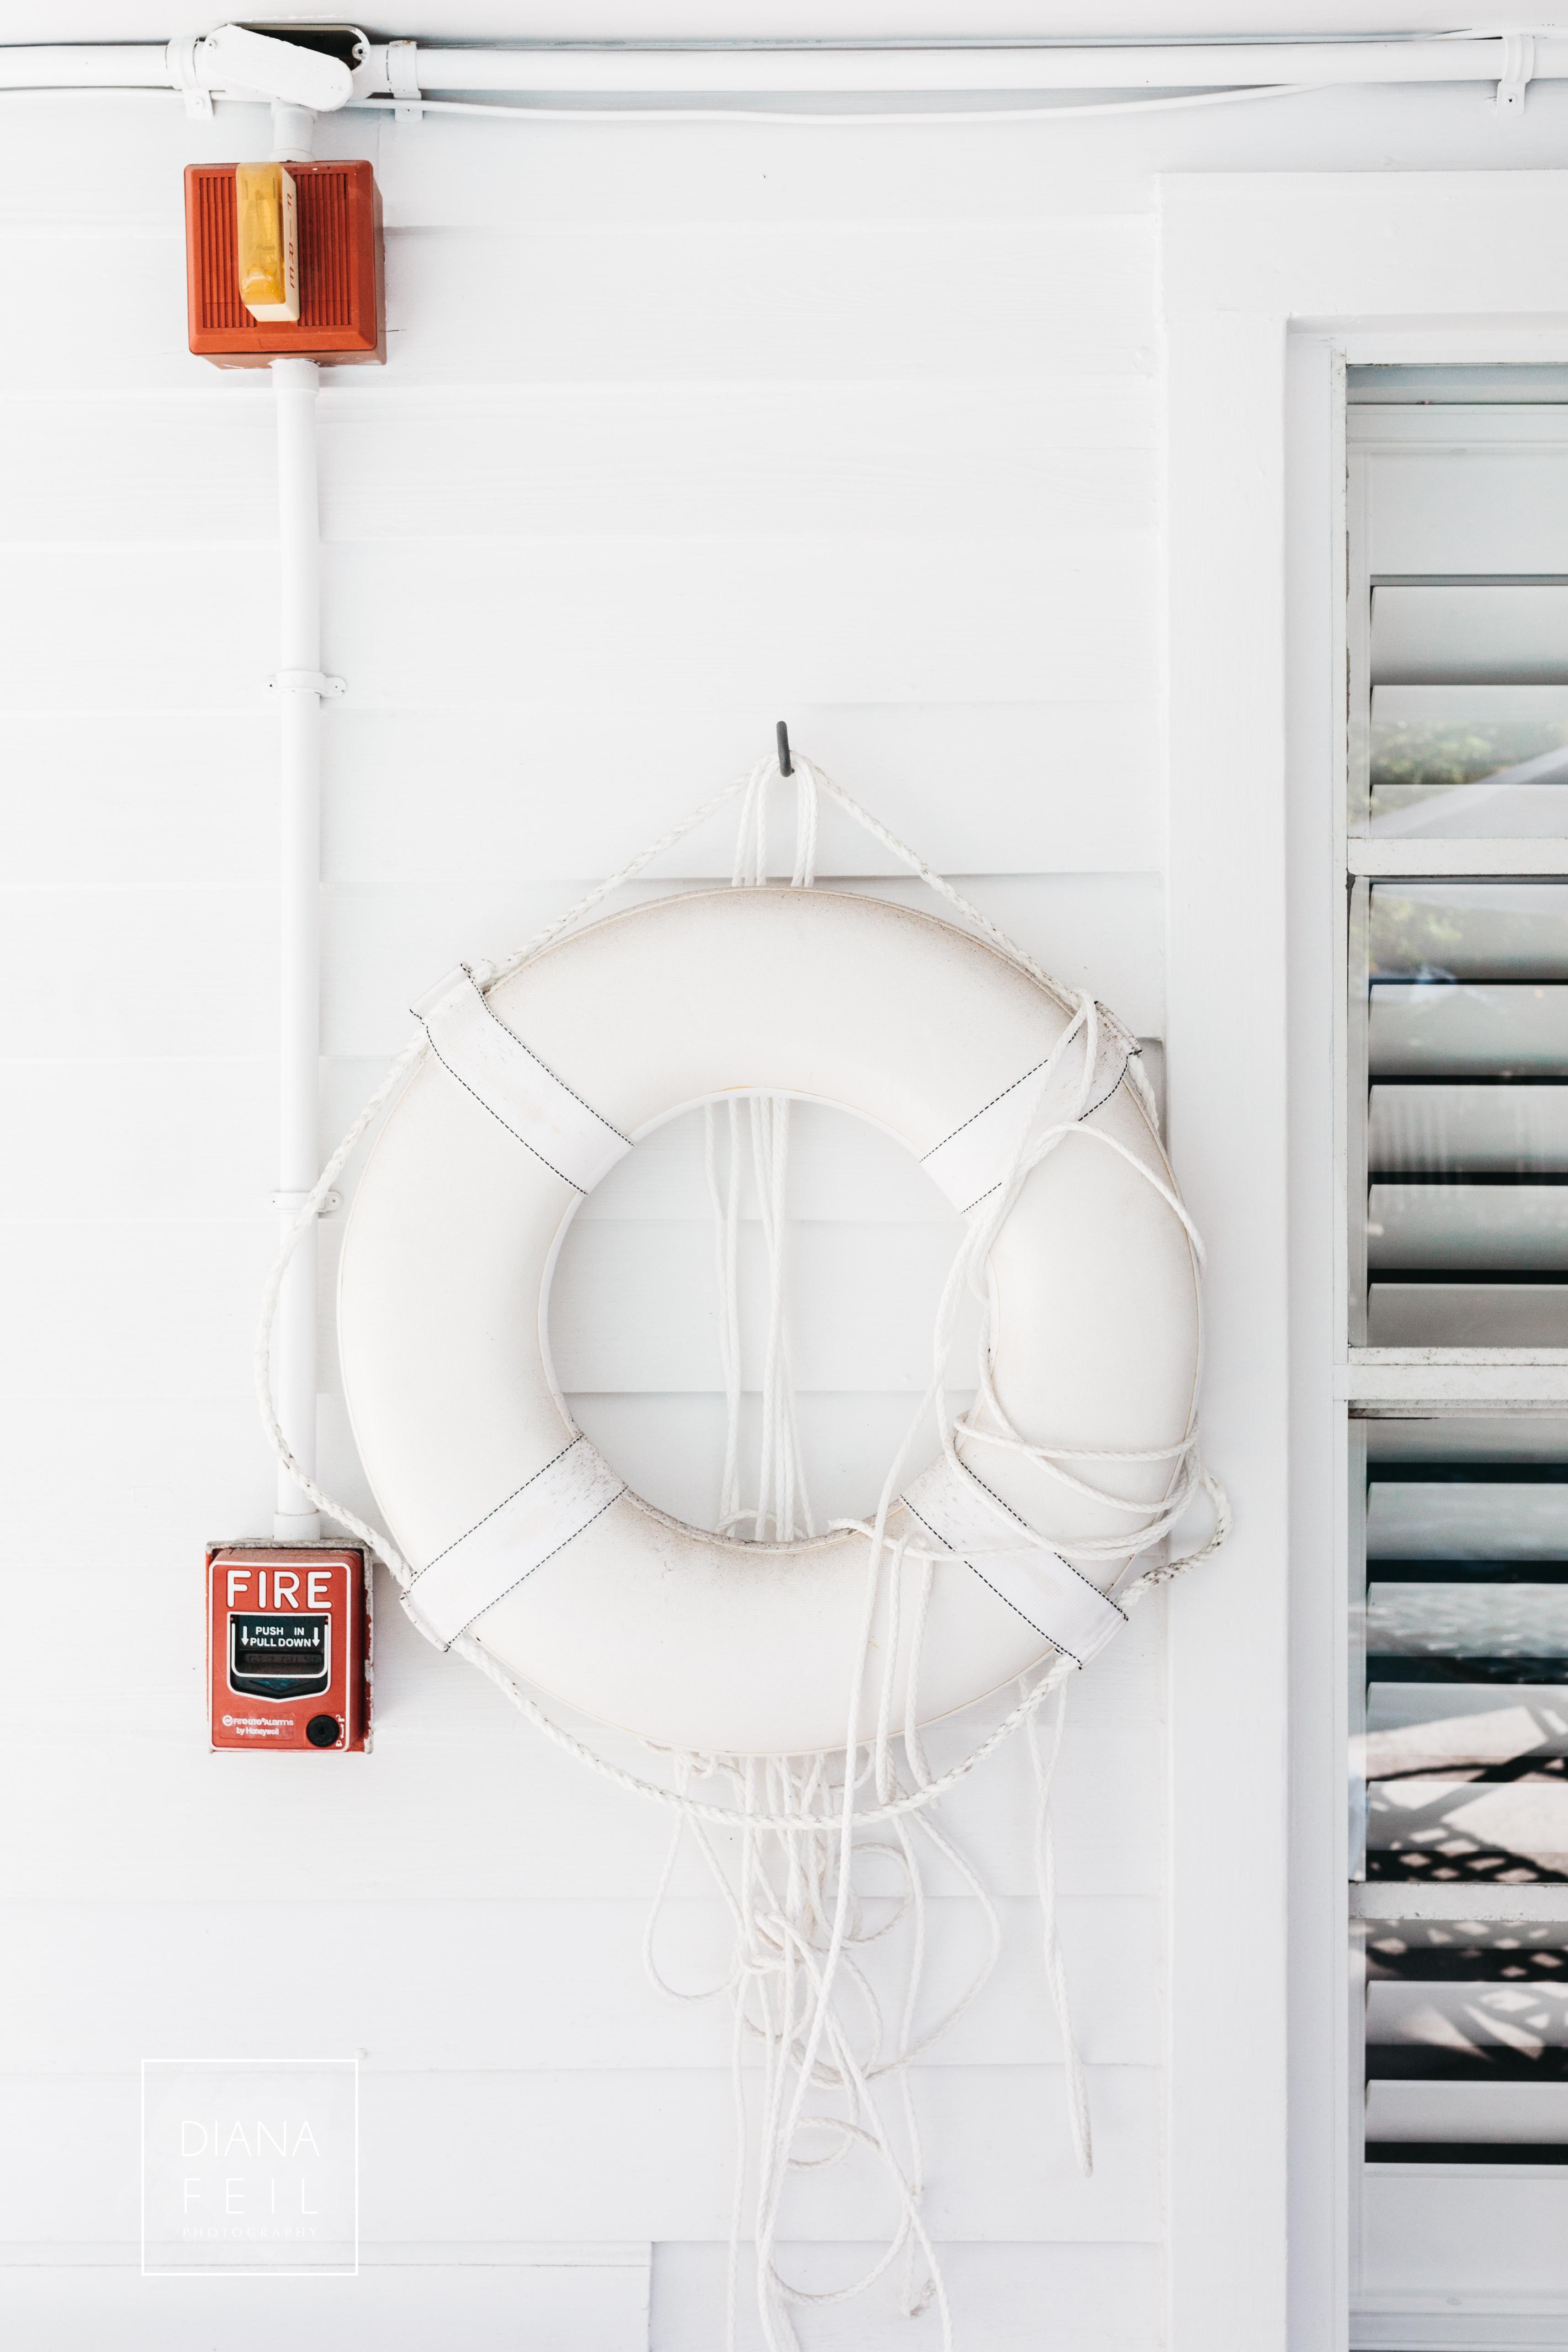 life belt vs. fire alarm.